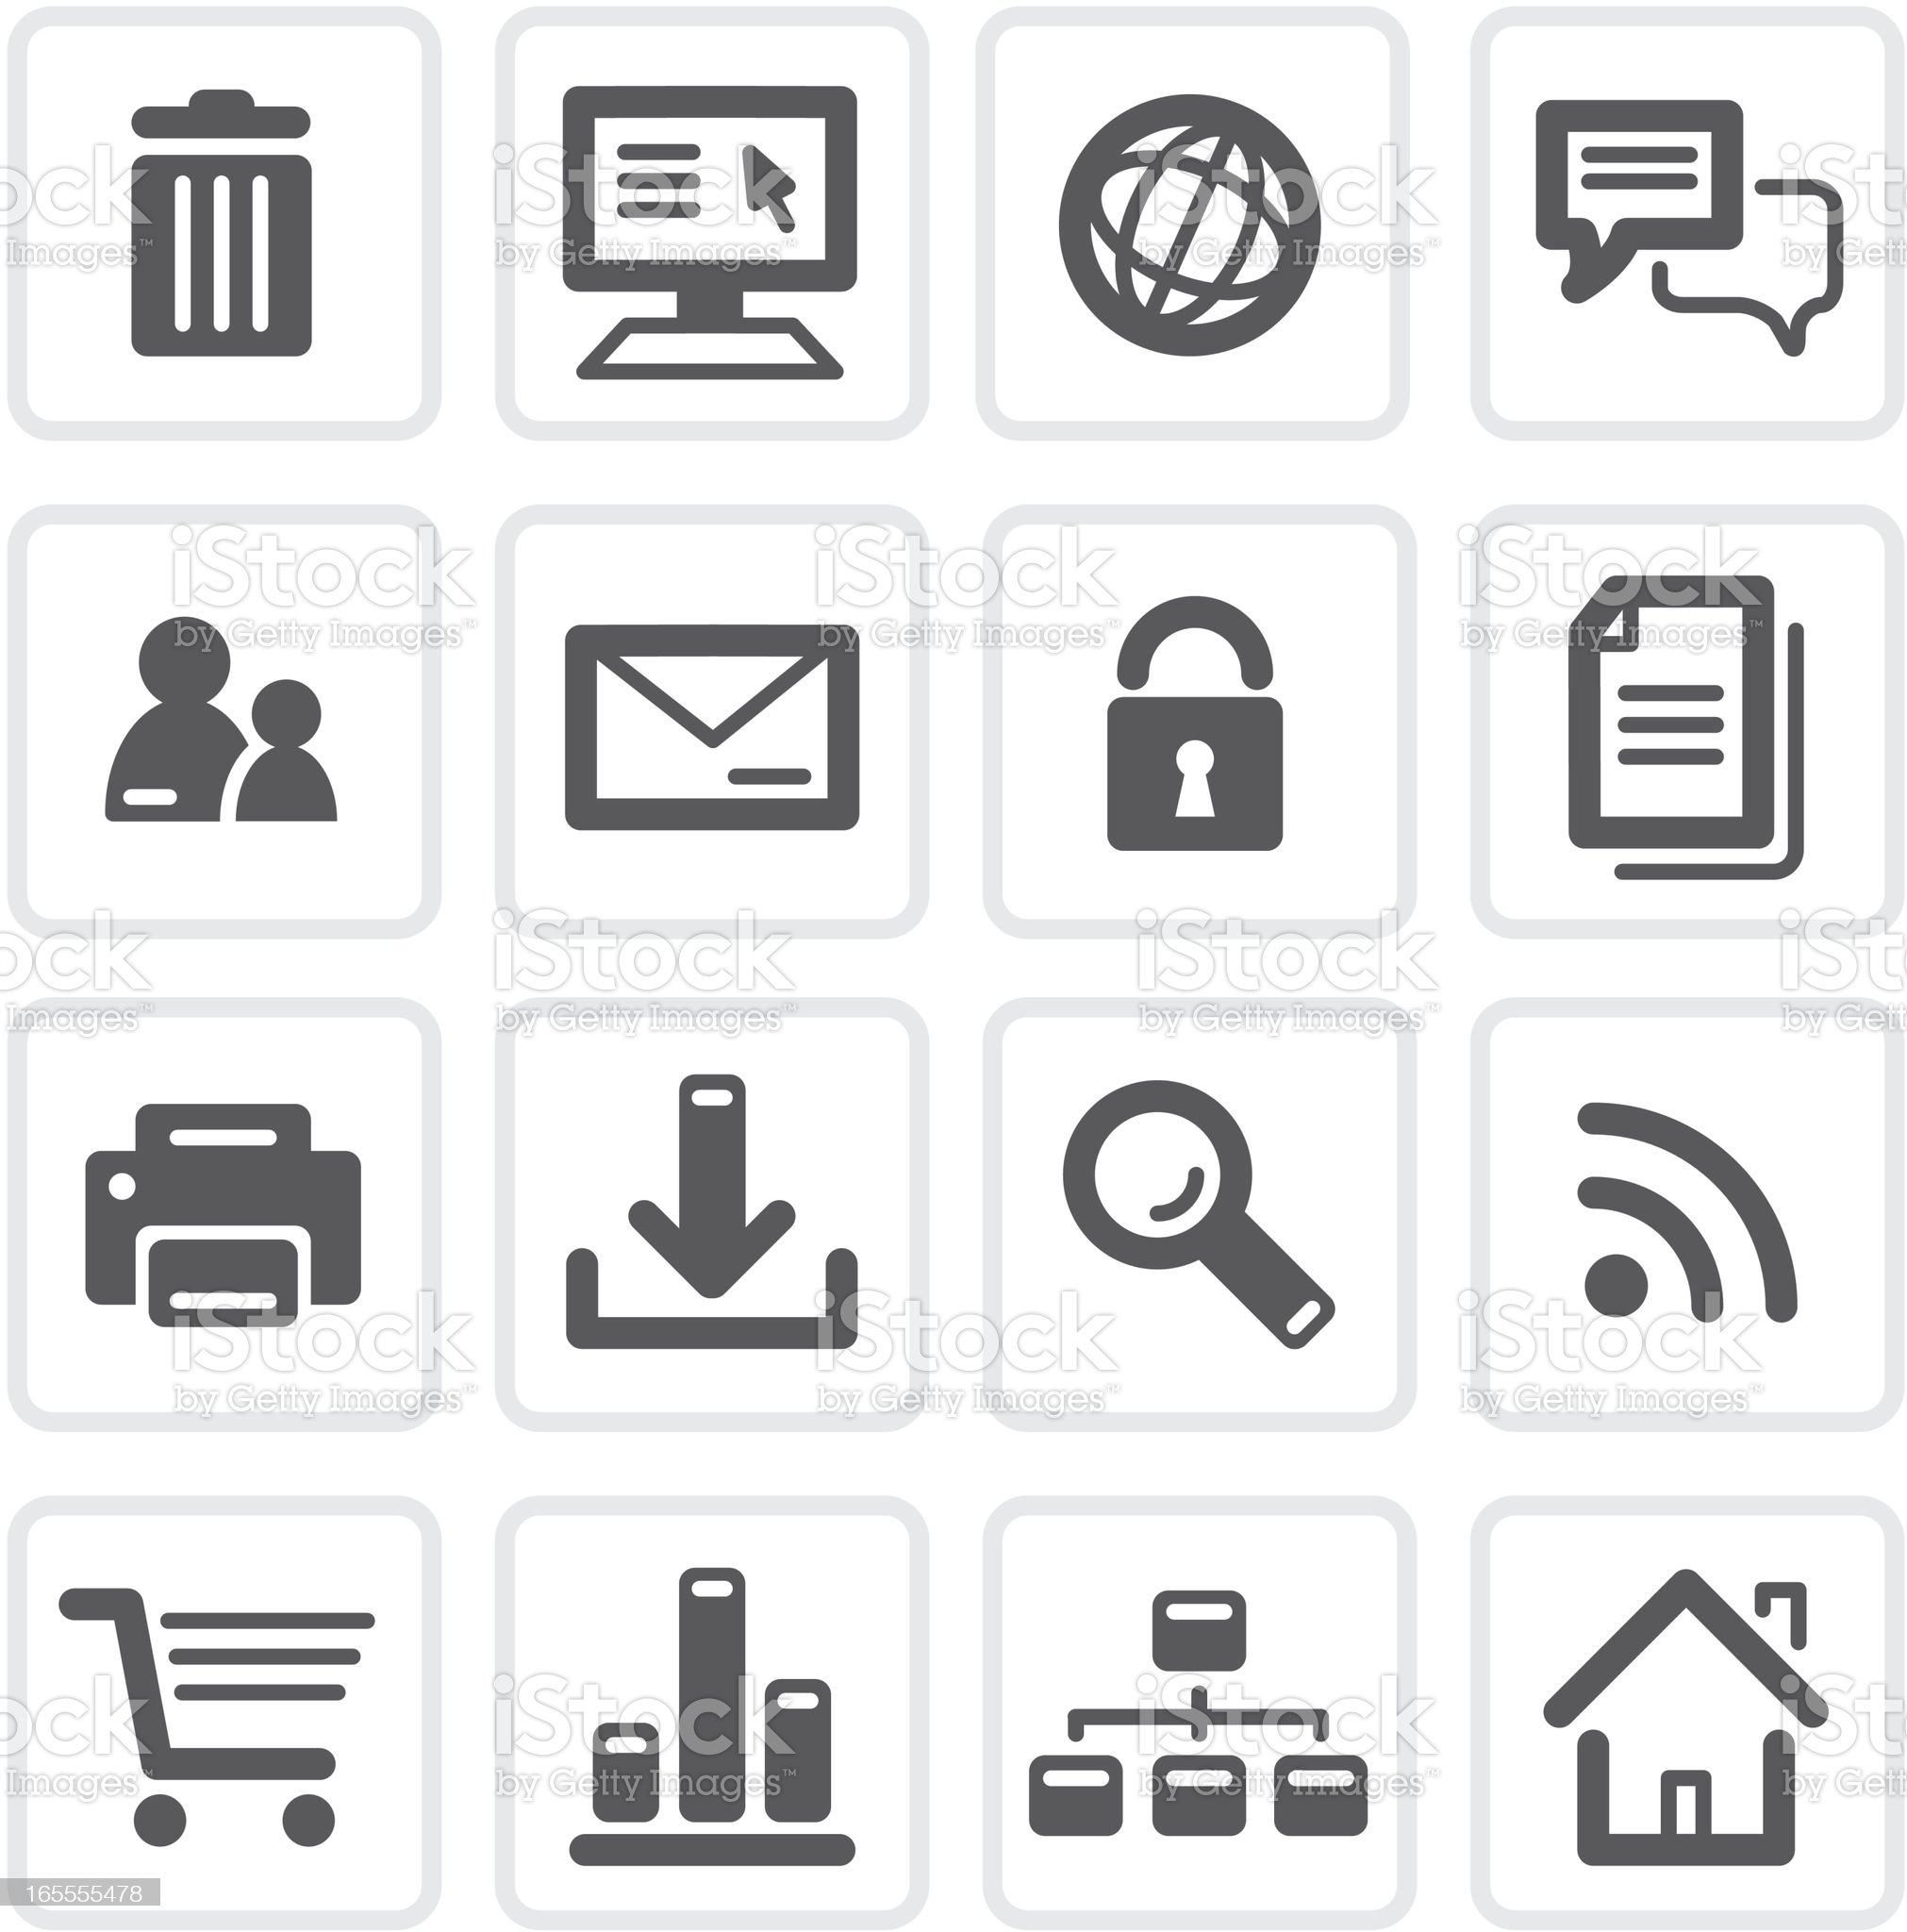 Internet Shopping Icons royalty-free stock vector art